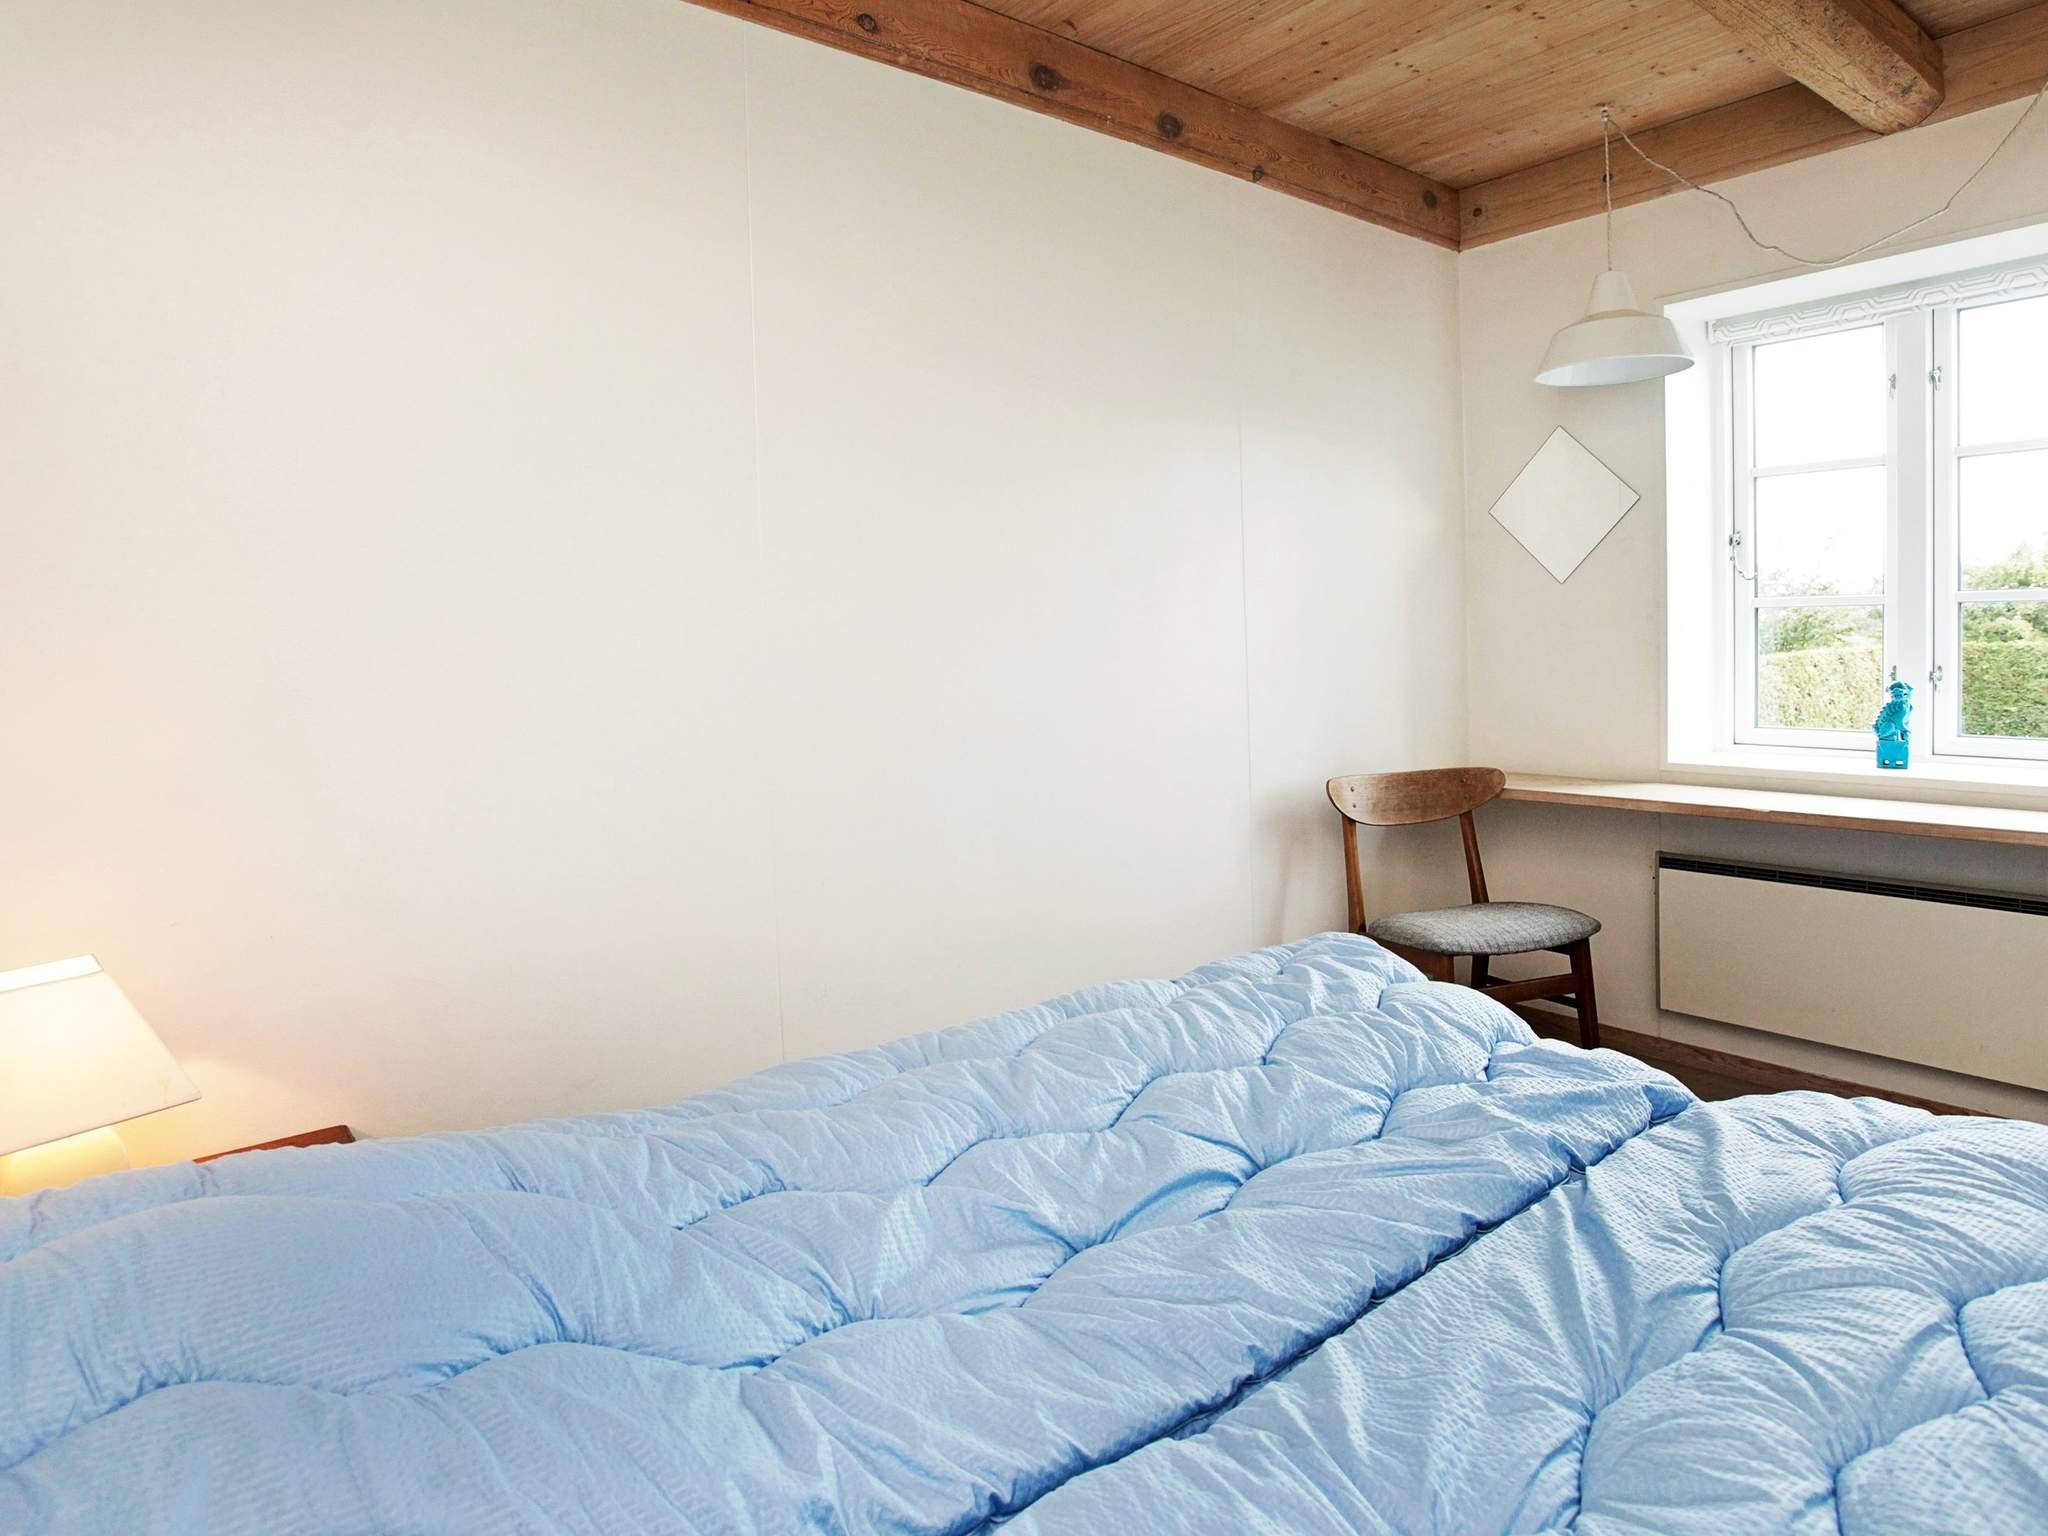 Appartement de vacances Horne (1990568), Horne, , Fionie, Danemark, image 12